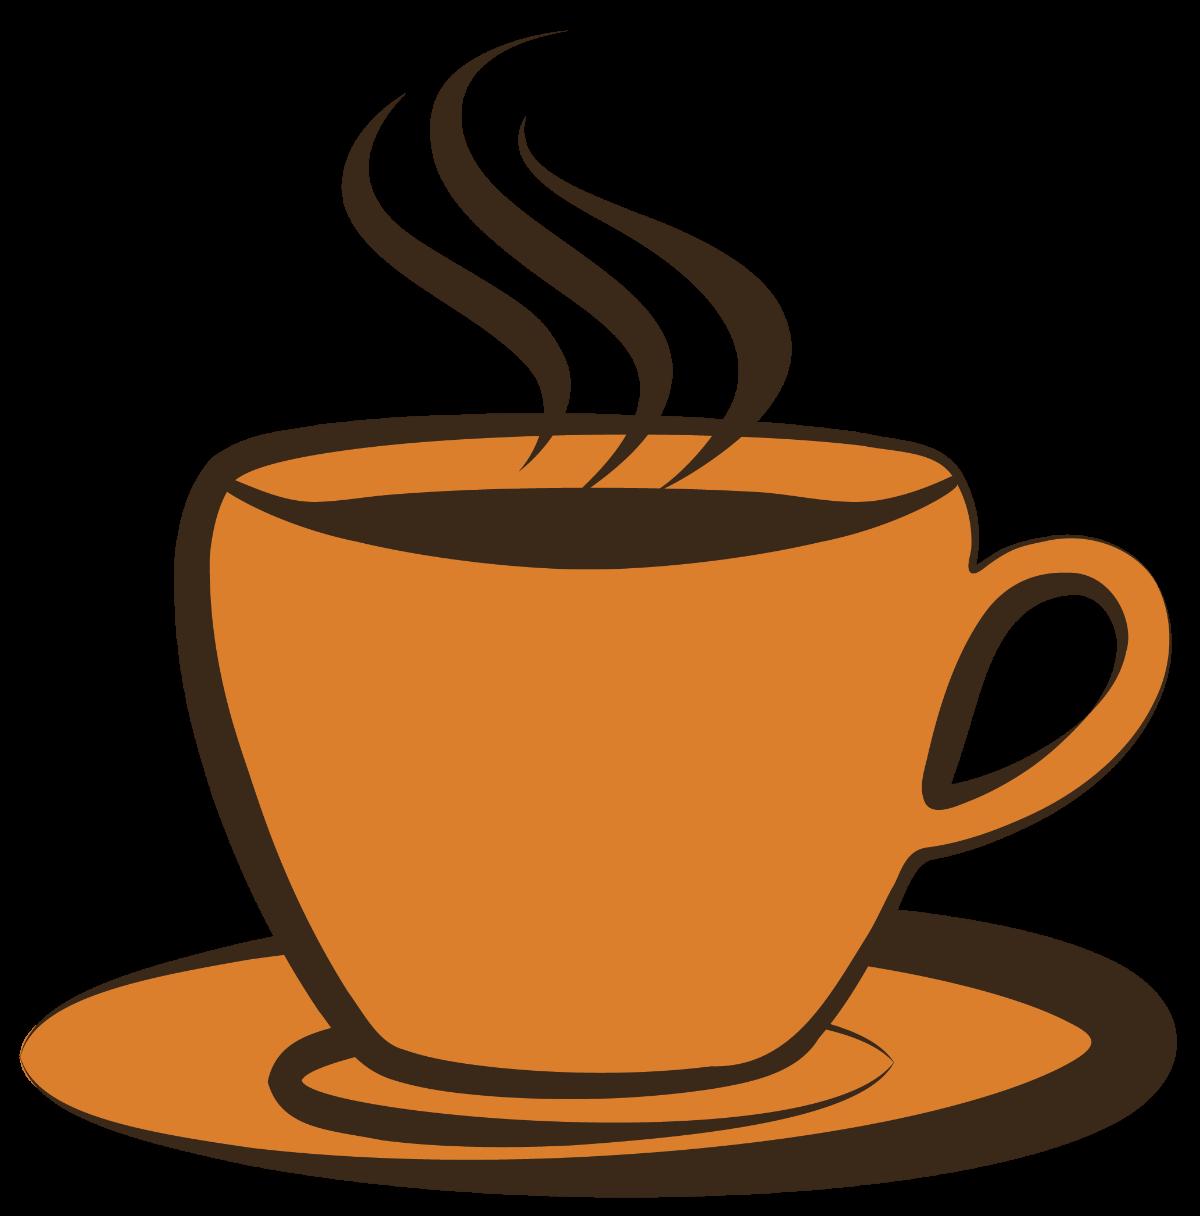 Free transparent coffee.